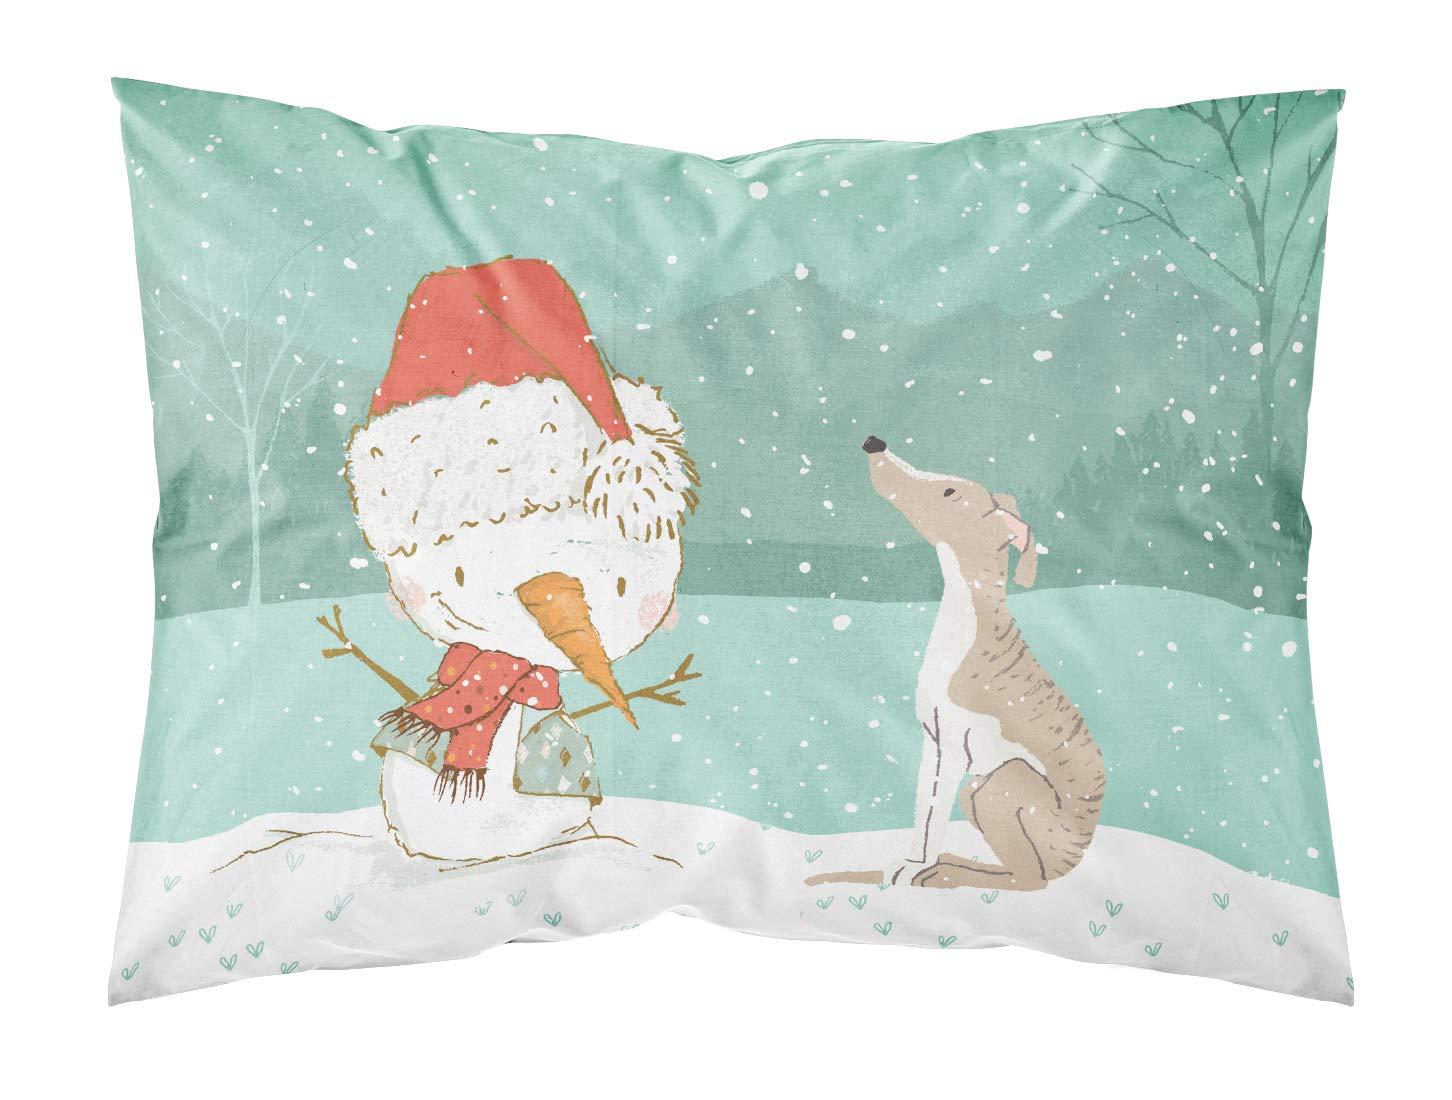 Caroline's Treasures Whippet 雪だるま クリスマス生地 スタンダード枕カバー マルチカラー B07J1TTV72